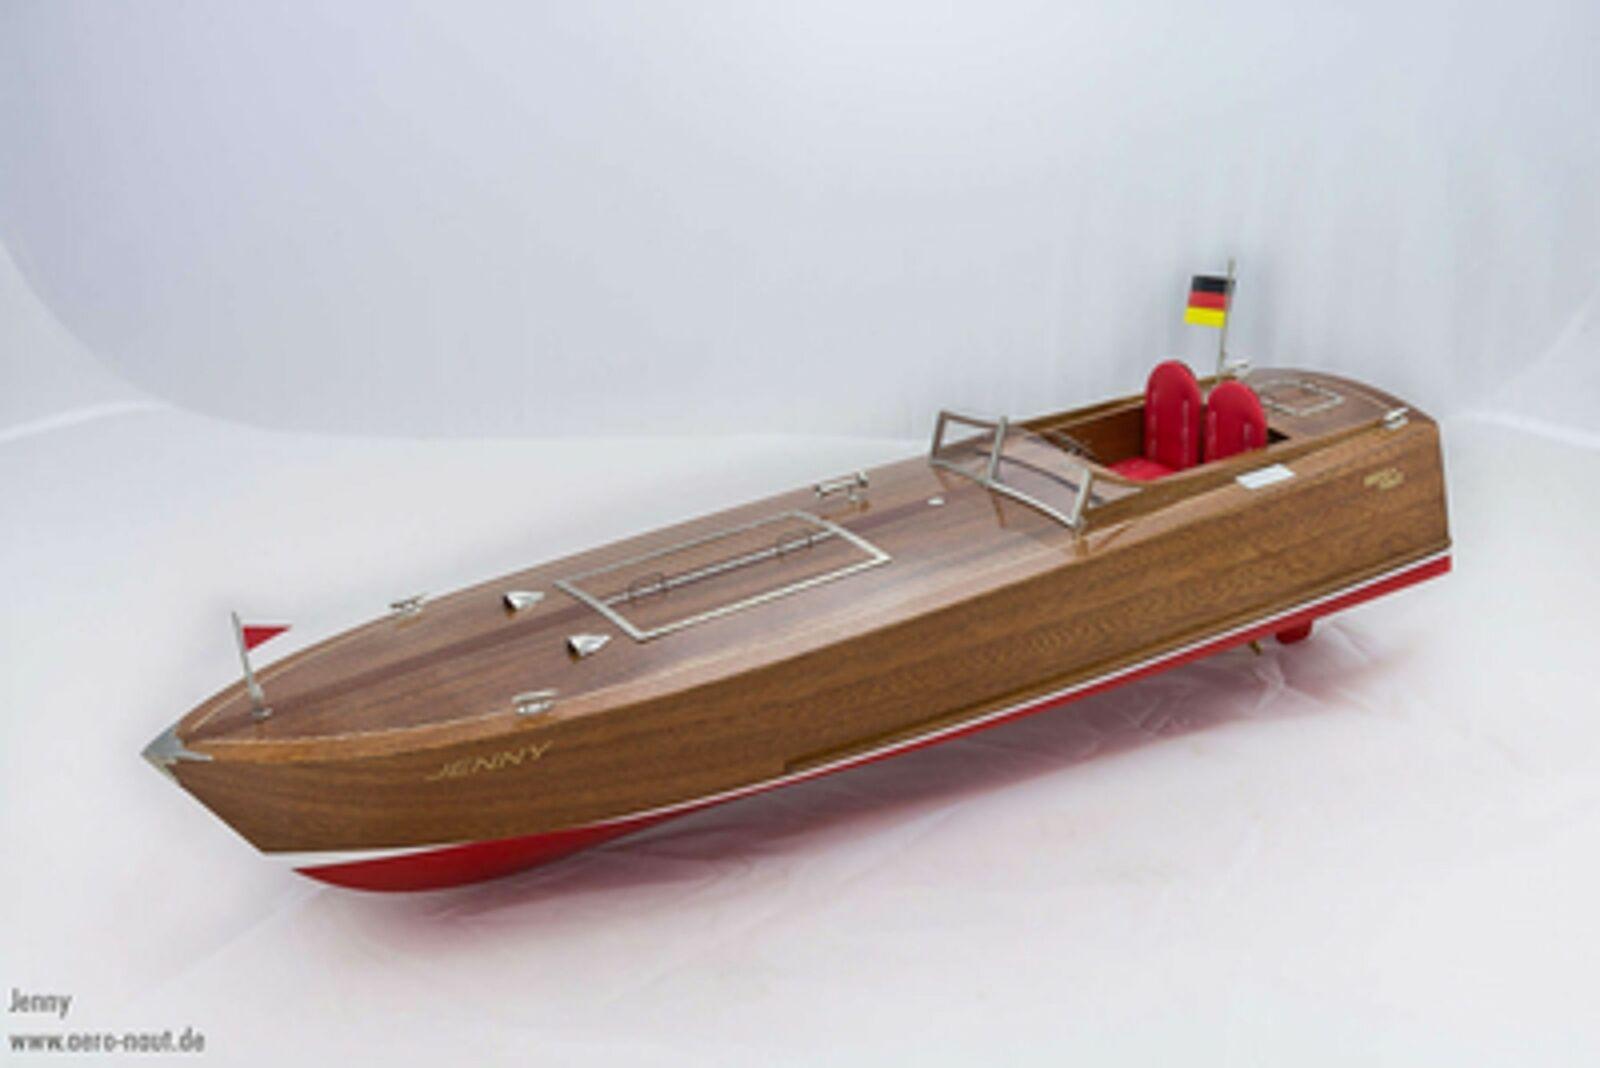 Jenny Sport bota 73cm aero-naut motor barco RC-sport bota caja de herramientas holzbaukasten